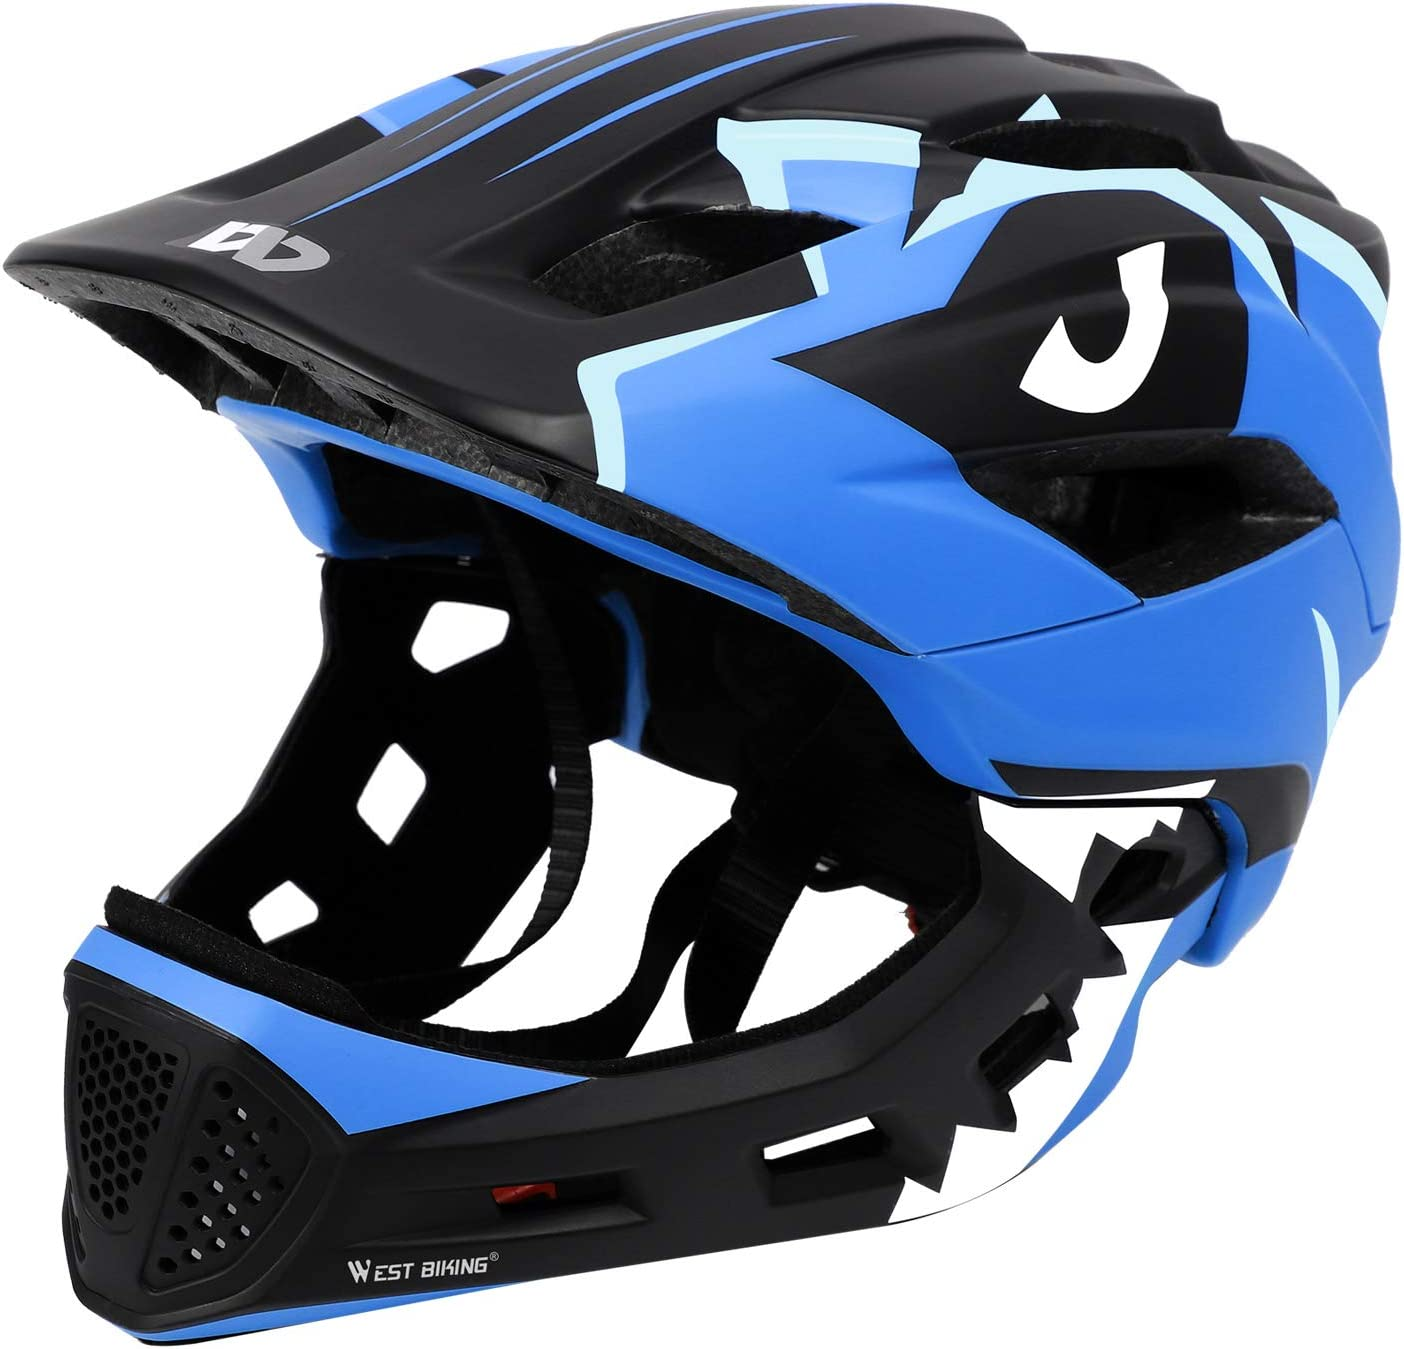 Kids Children Boy Girl Cycle Safety Helmet Bike Bicycle Skating Full Face Helmet